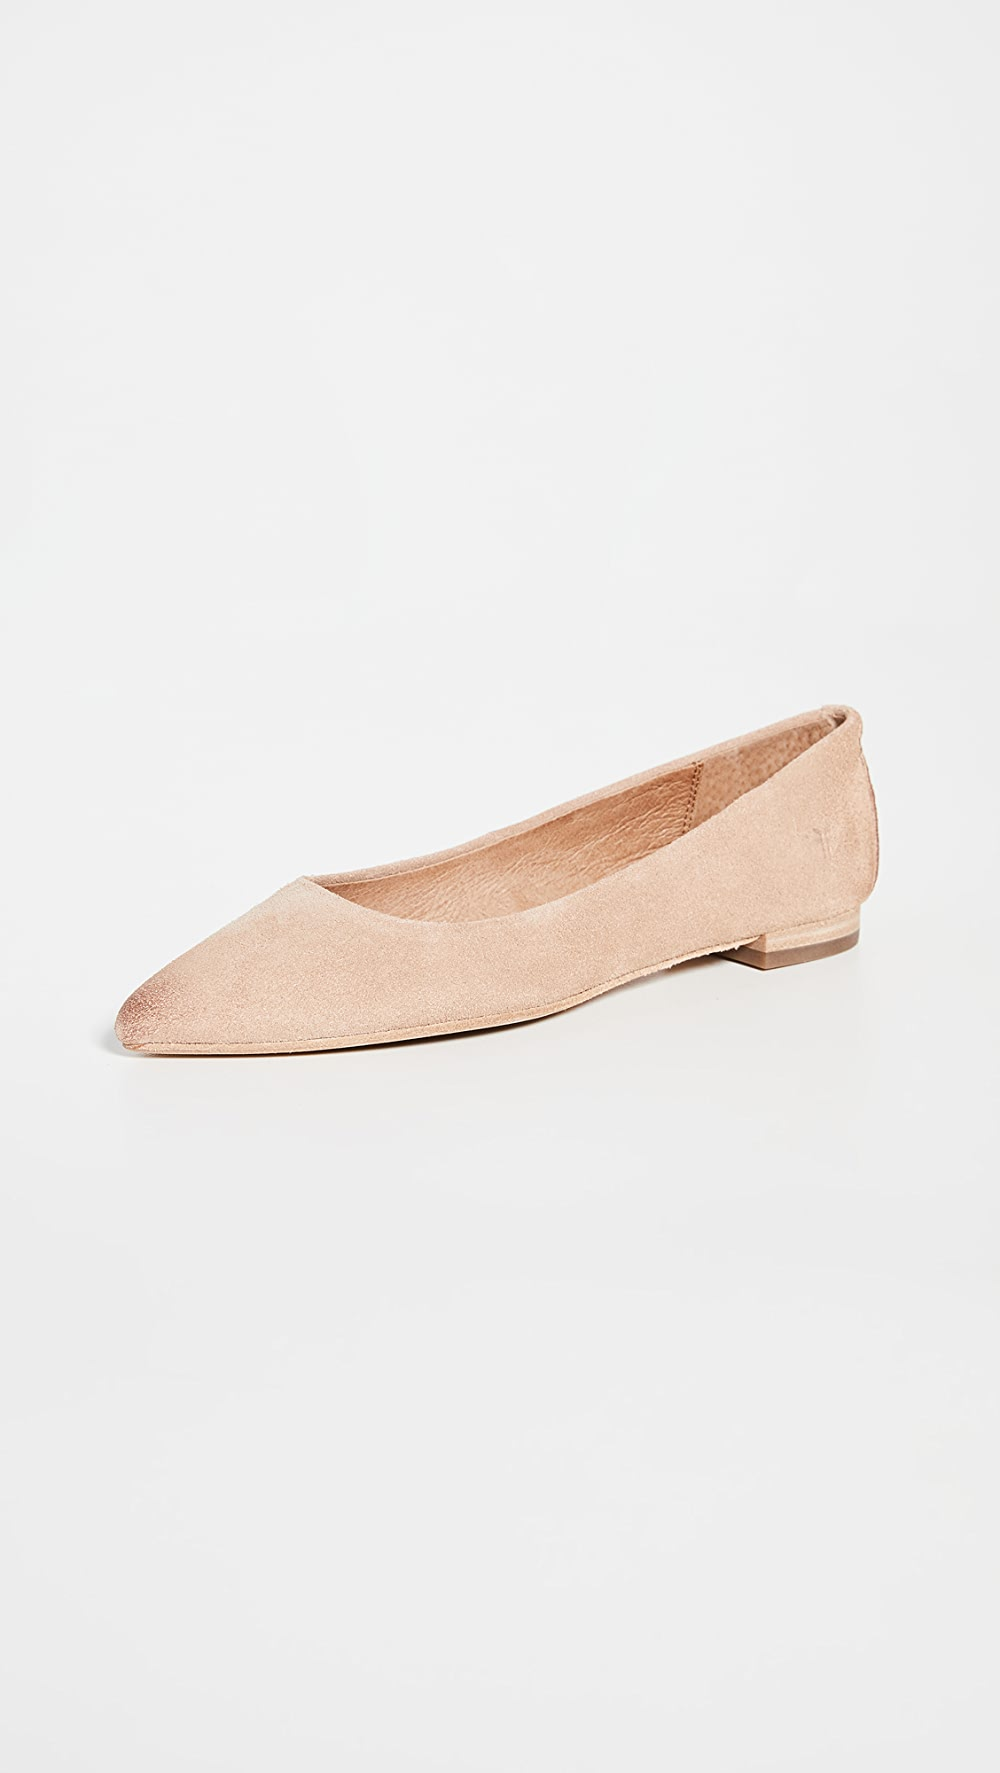 Competent Frye - Sienna Ballet Flats 50% OFF